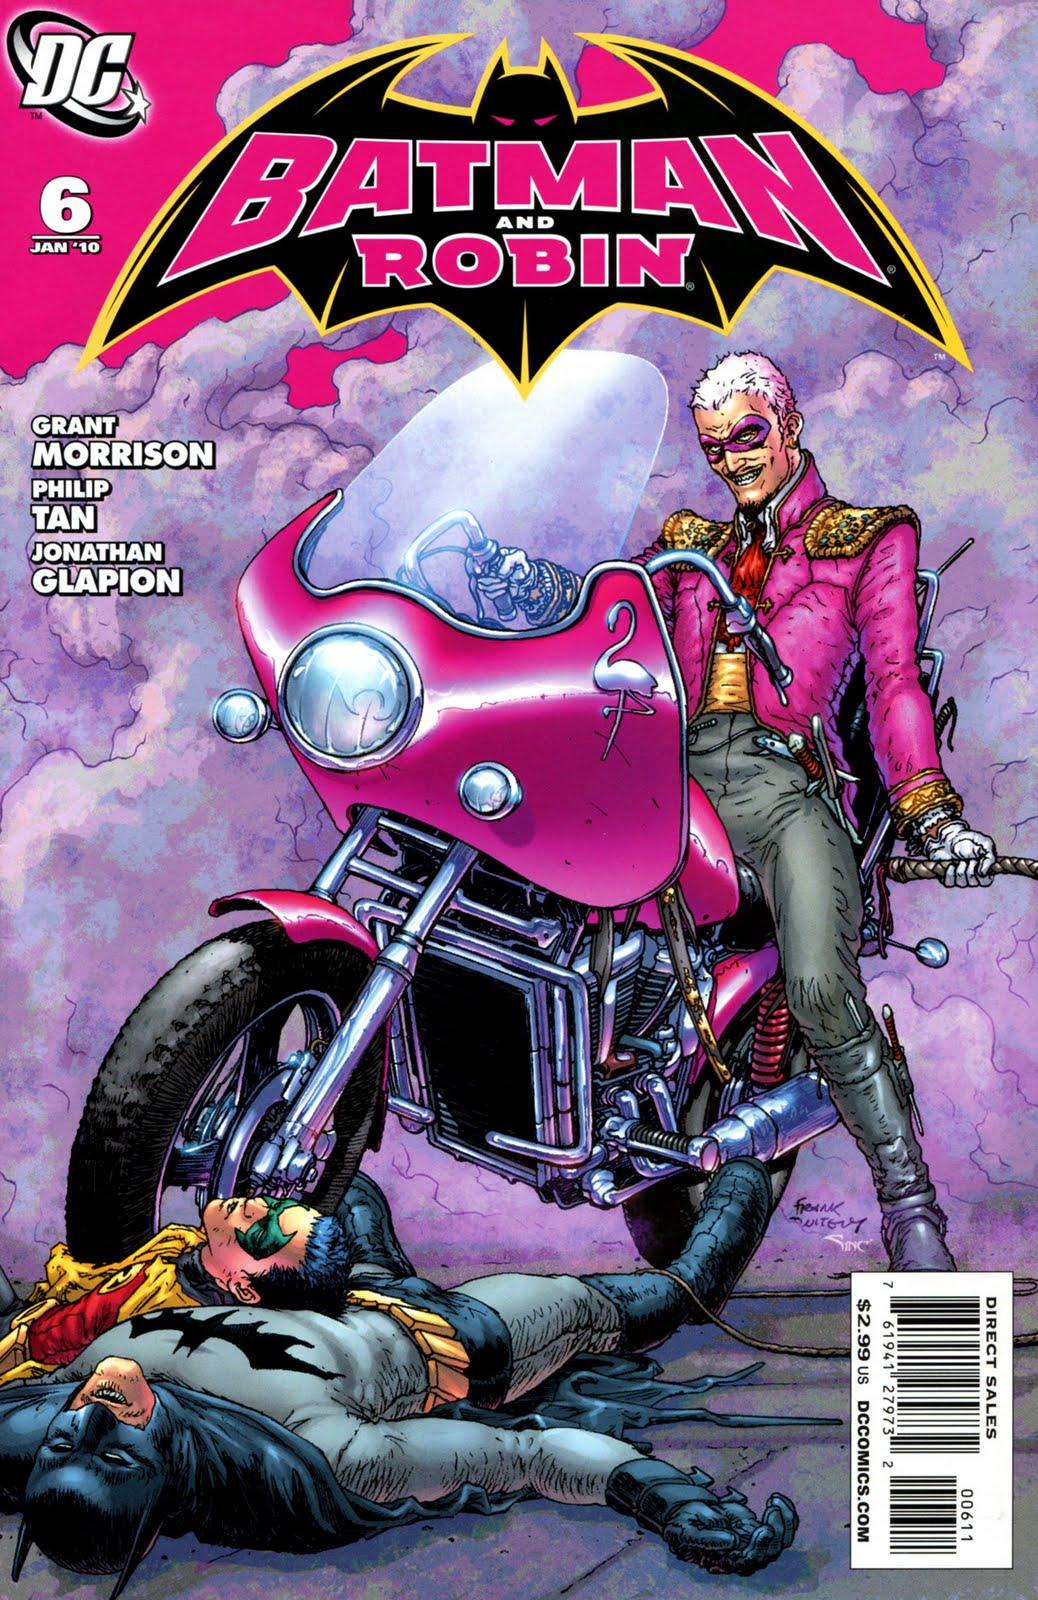 Batman and Robin (Volume 1) Issue 6 - Batman Wiki